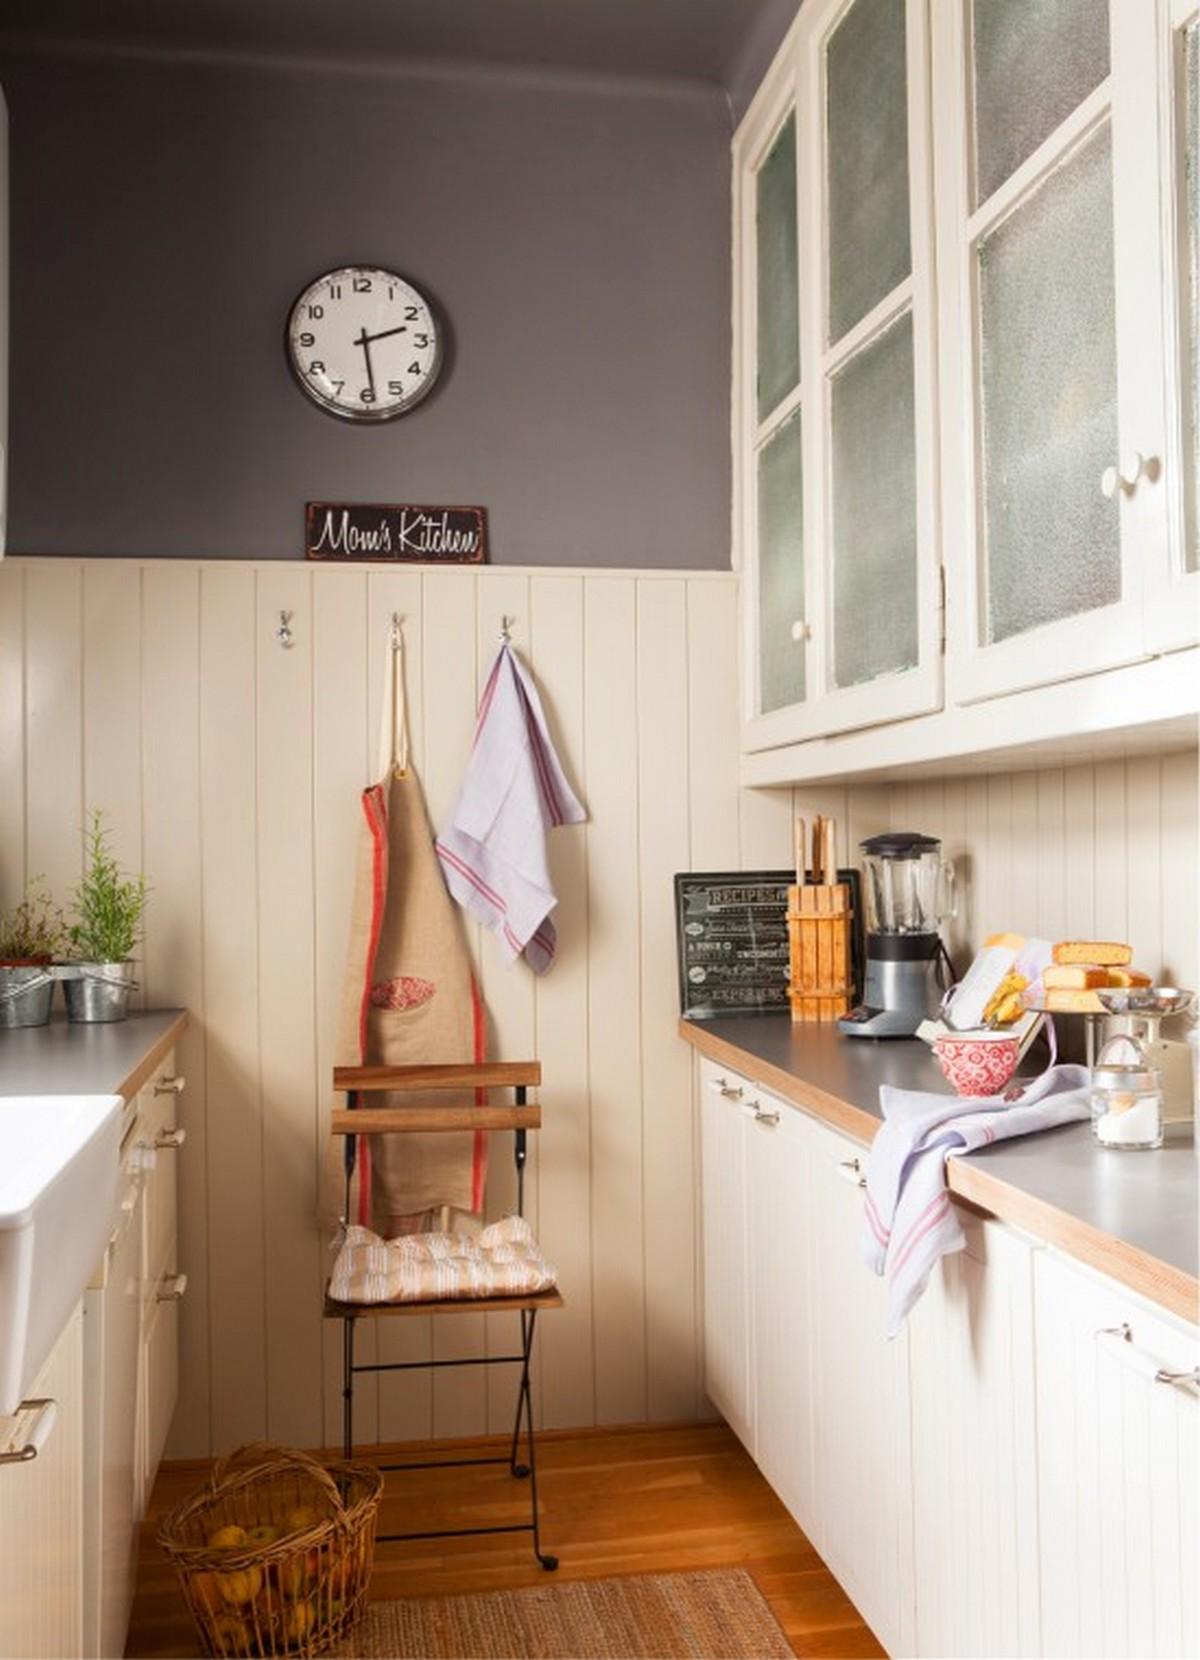 двухрядная кухня 6 кв м